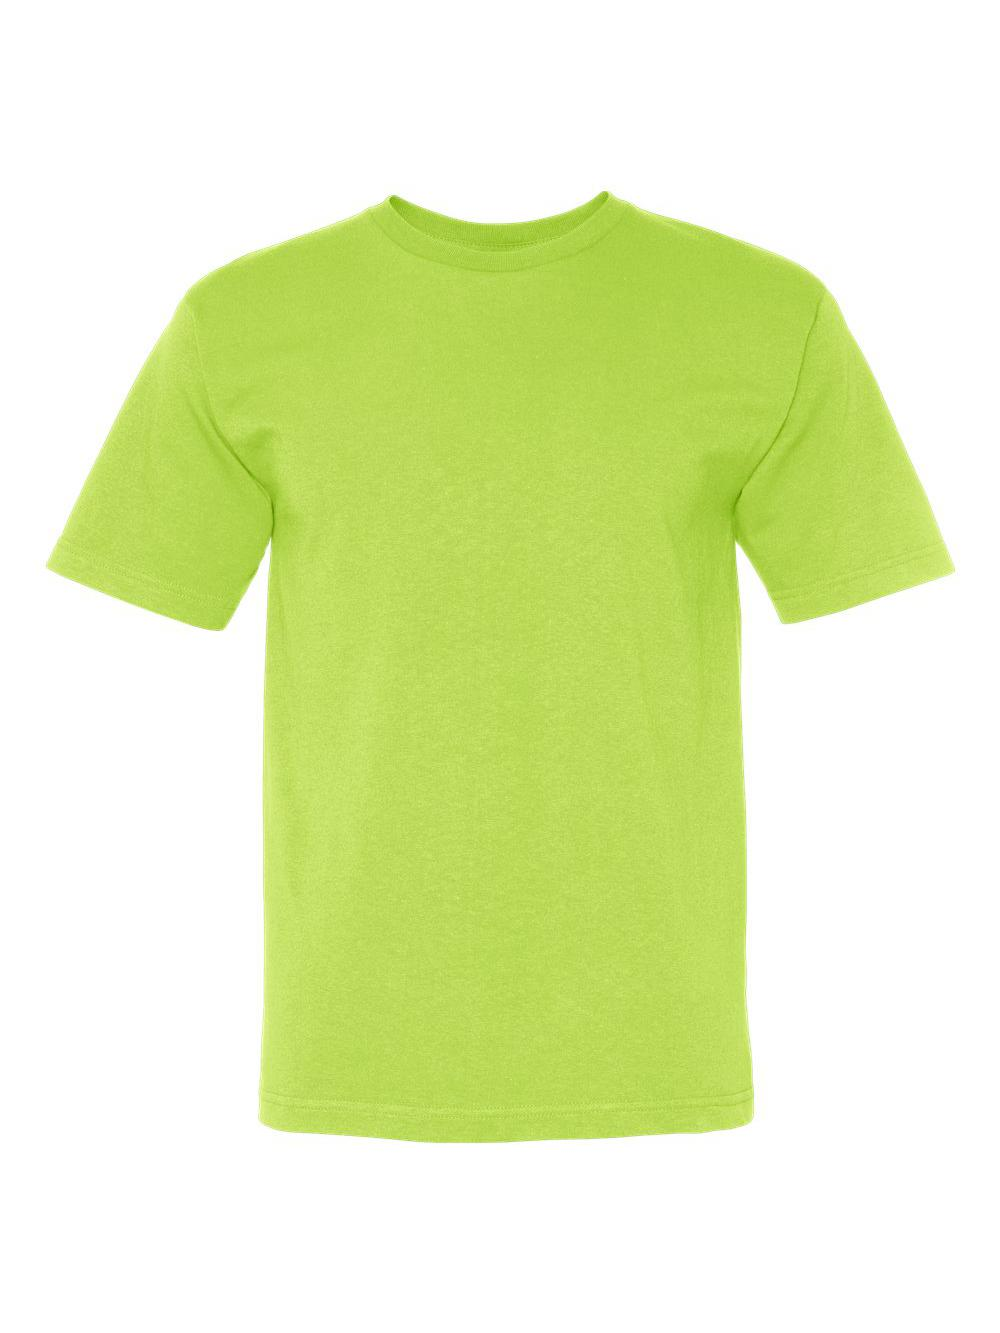 Bayside-USA-Made-100-Cotton-Short-Sleeve-T-Shirt-5040 thumbnail 21